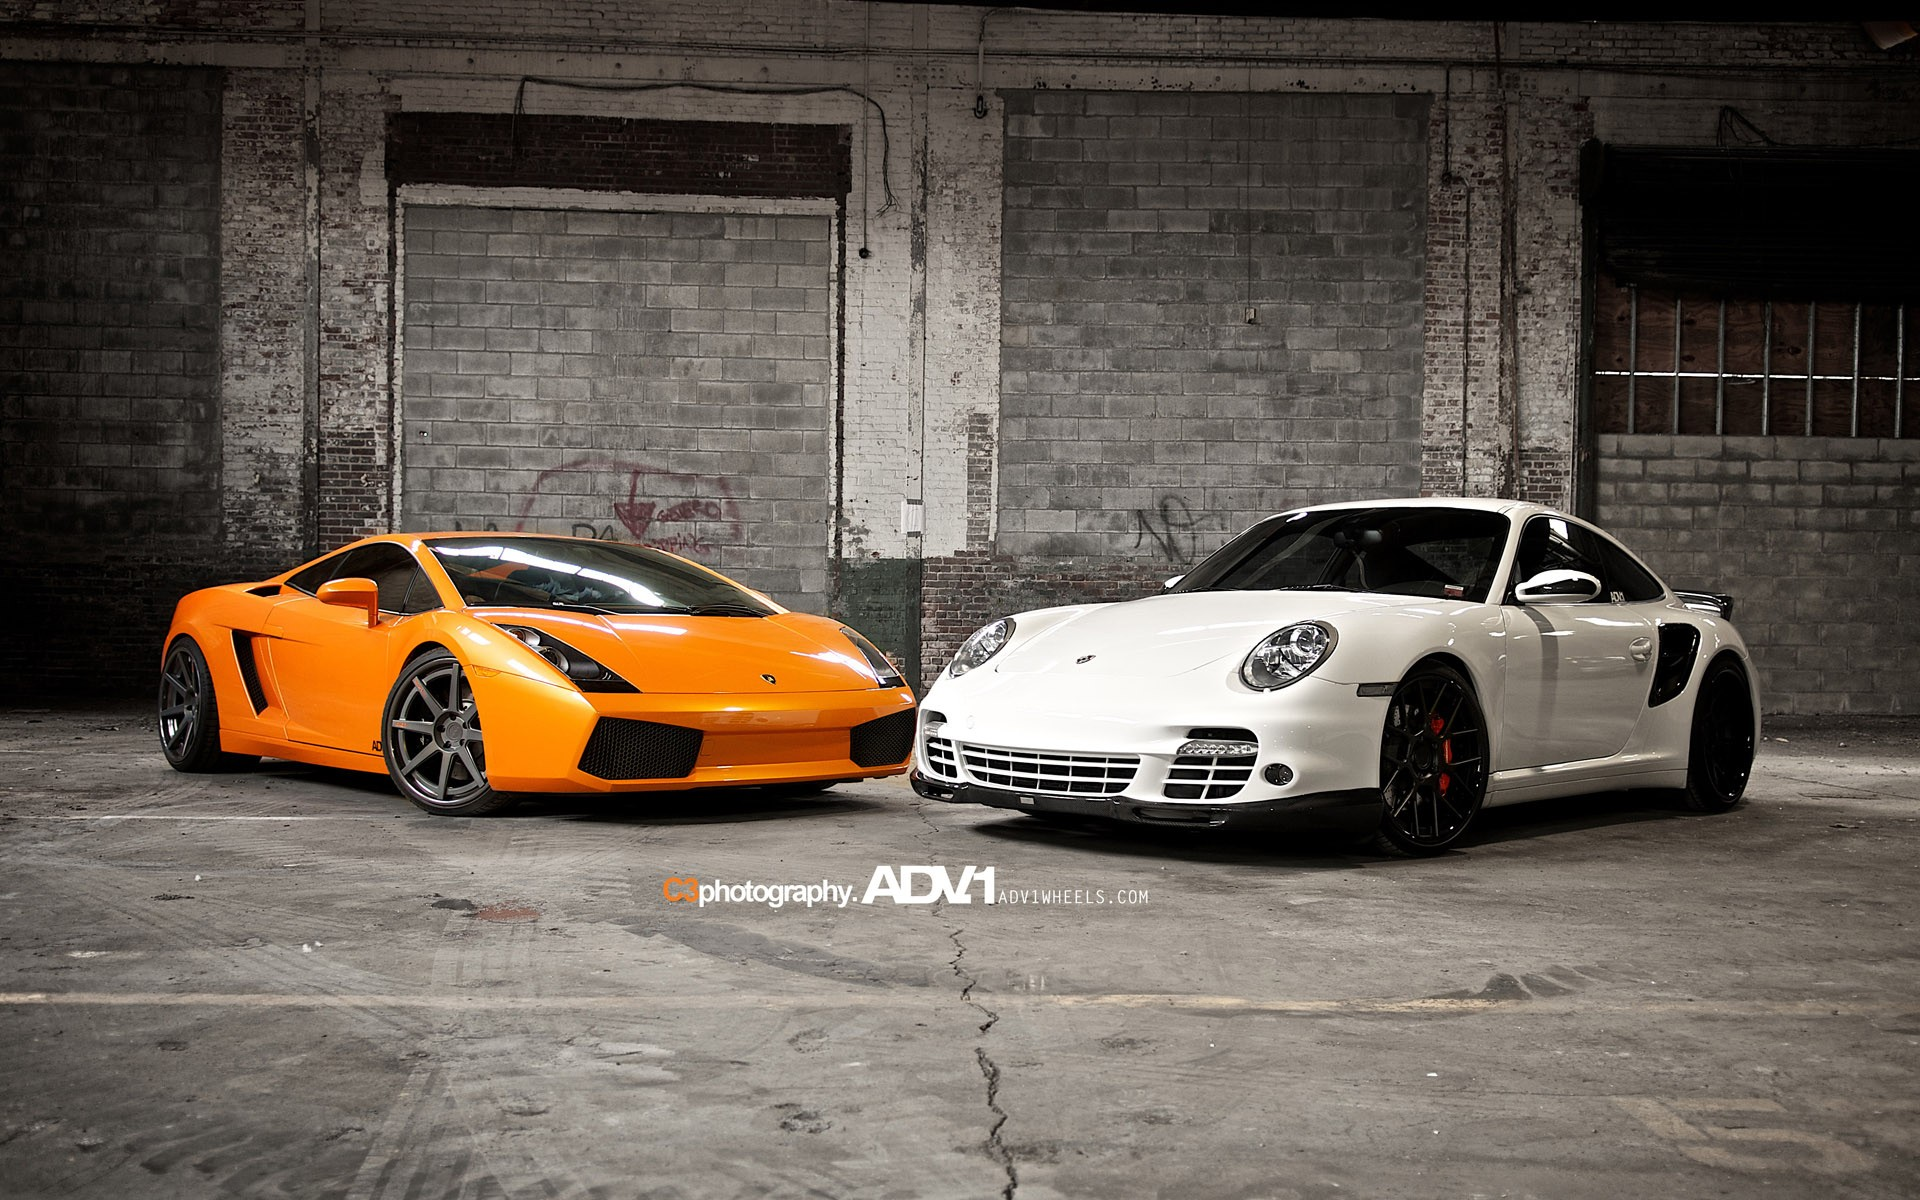 Lamborghini Gallardo And Porsche 997 TT Wallpaper HD Car